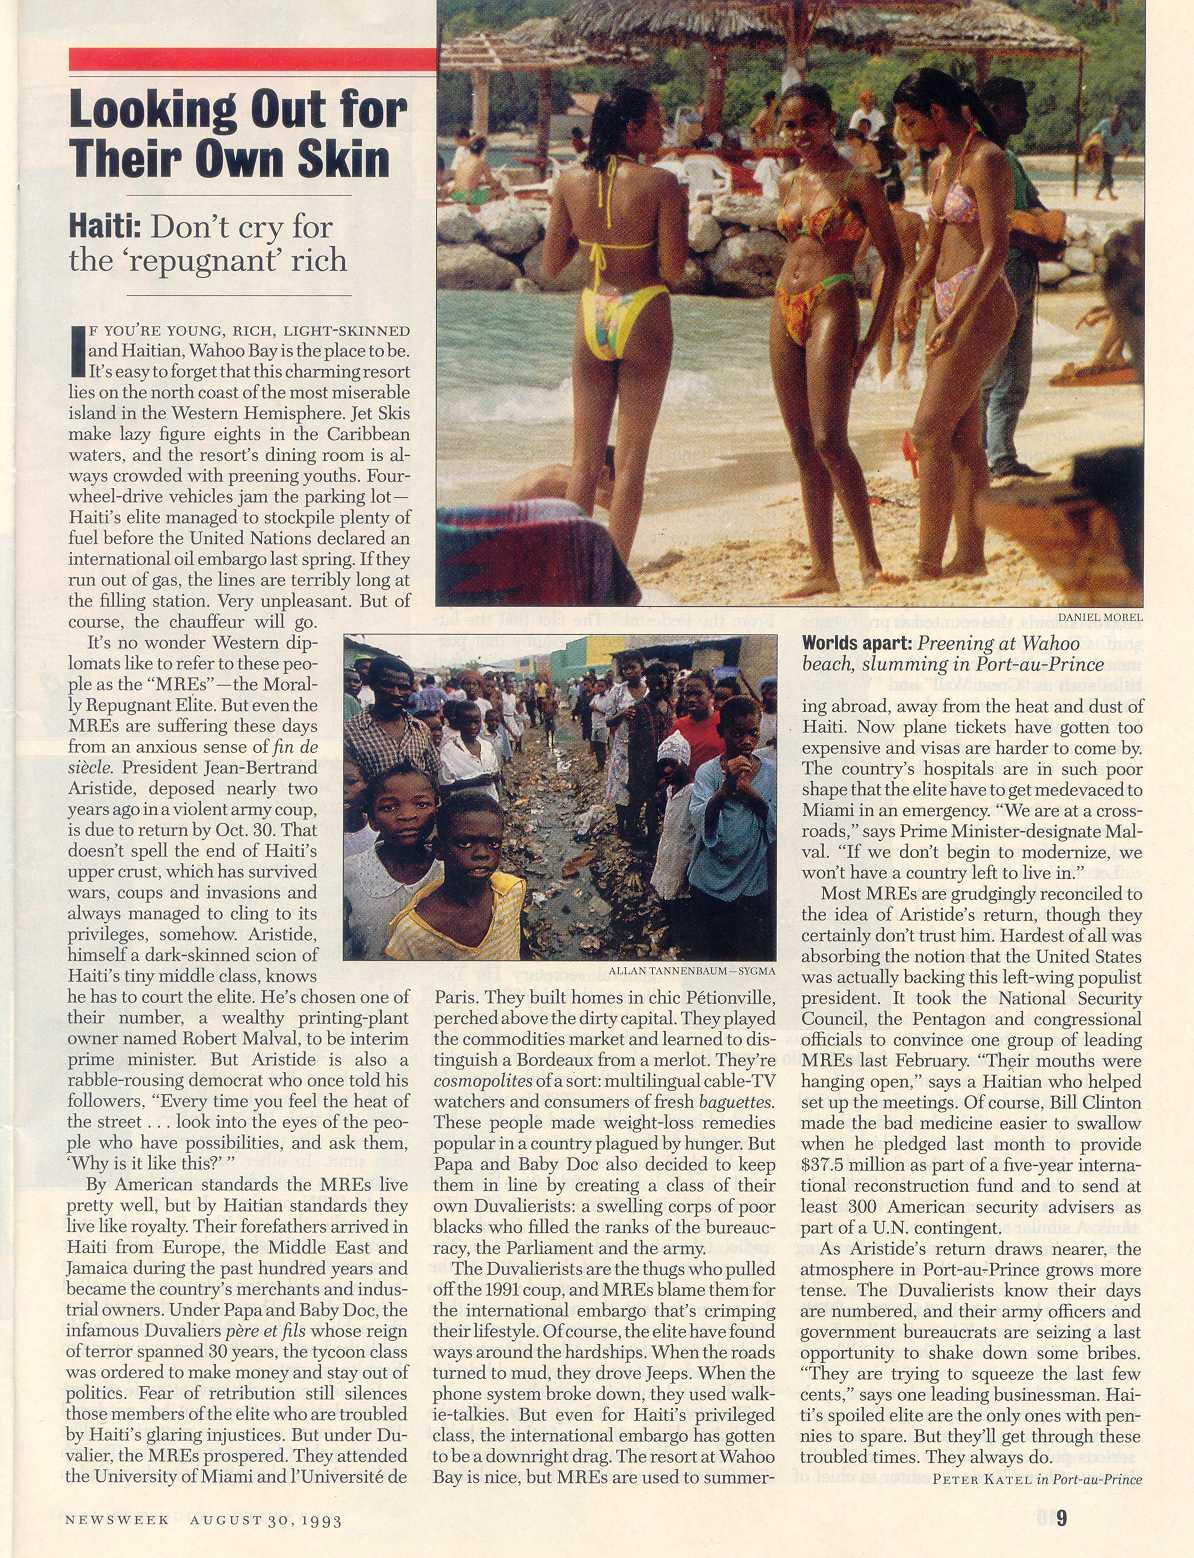 Peter Katel in Port Au Prince, Haiti – NEWSWEEK Magazine (1993)